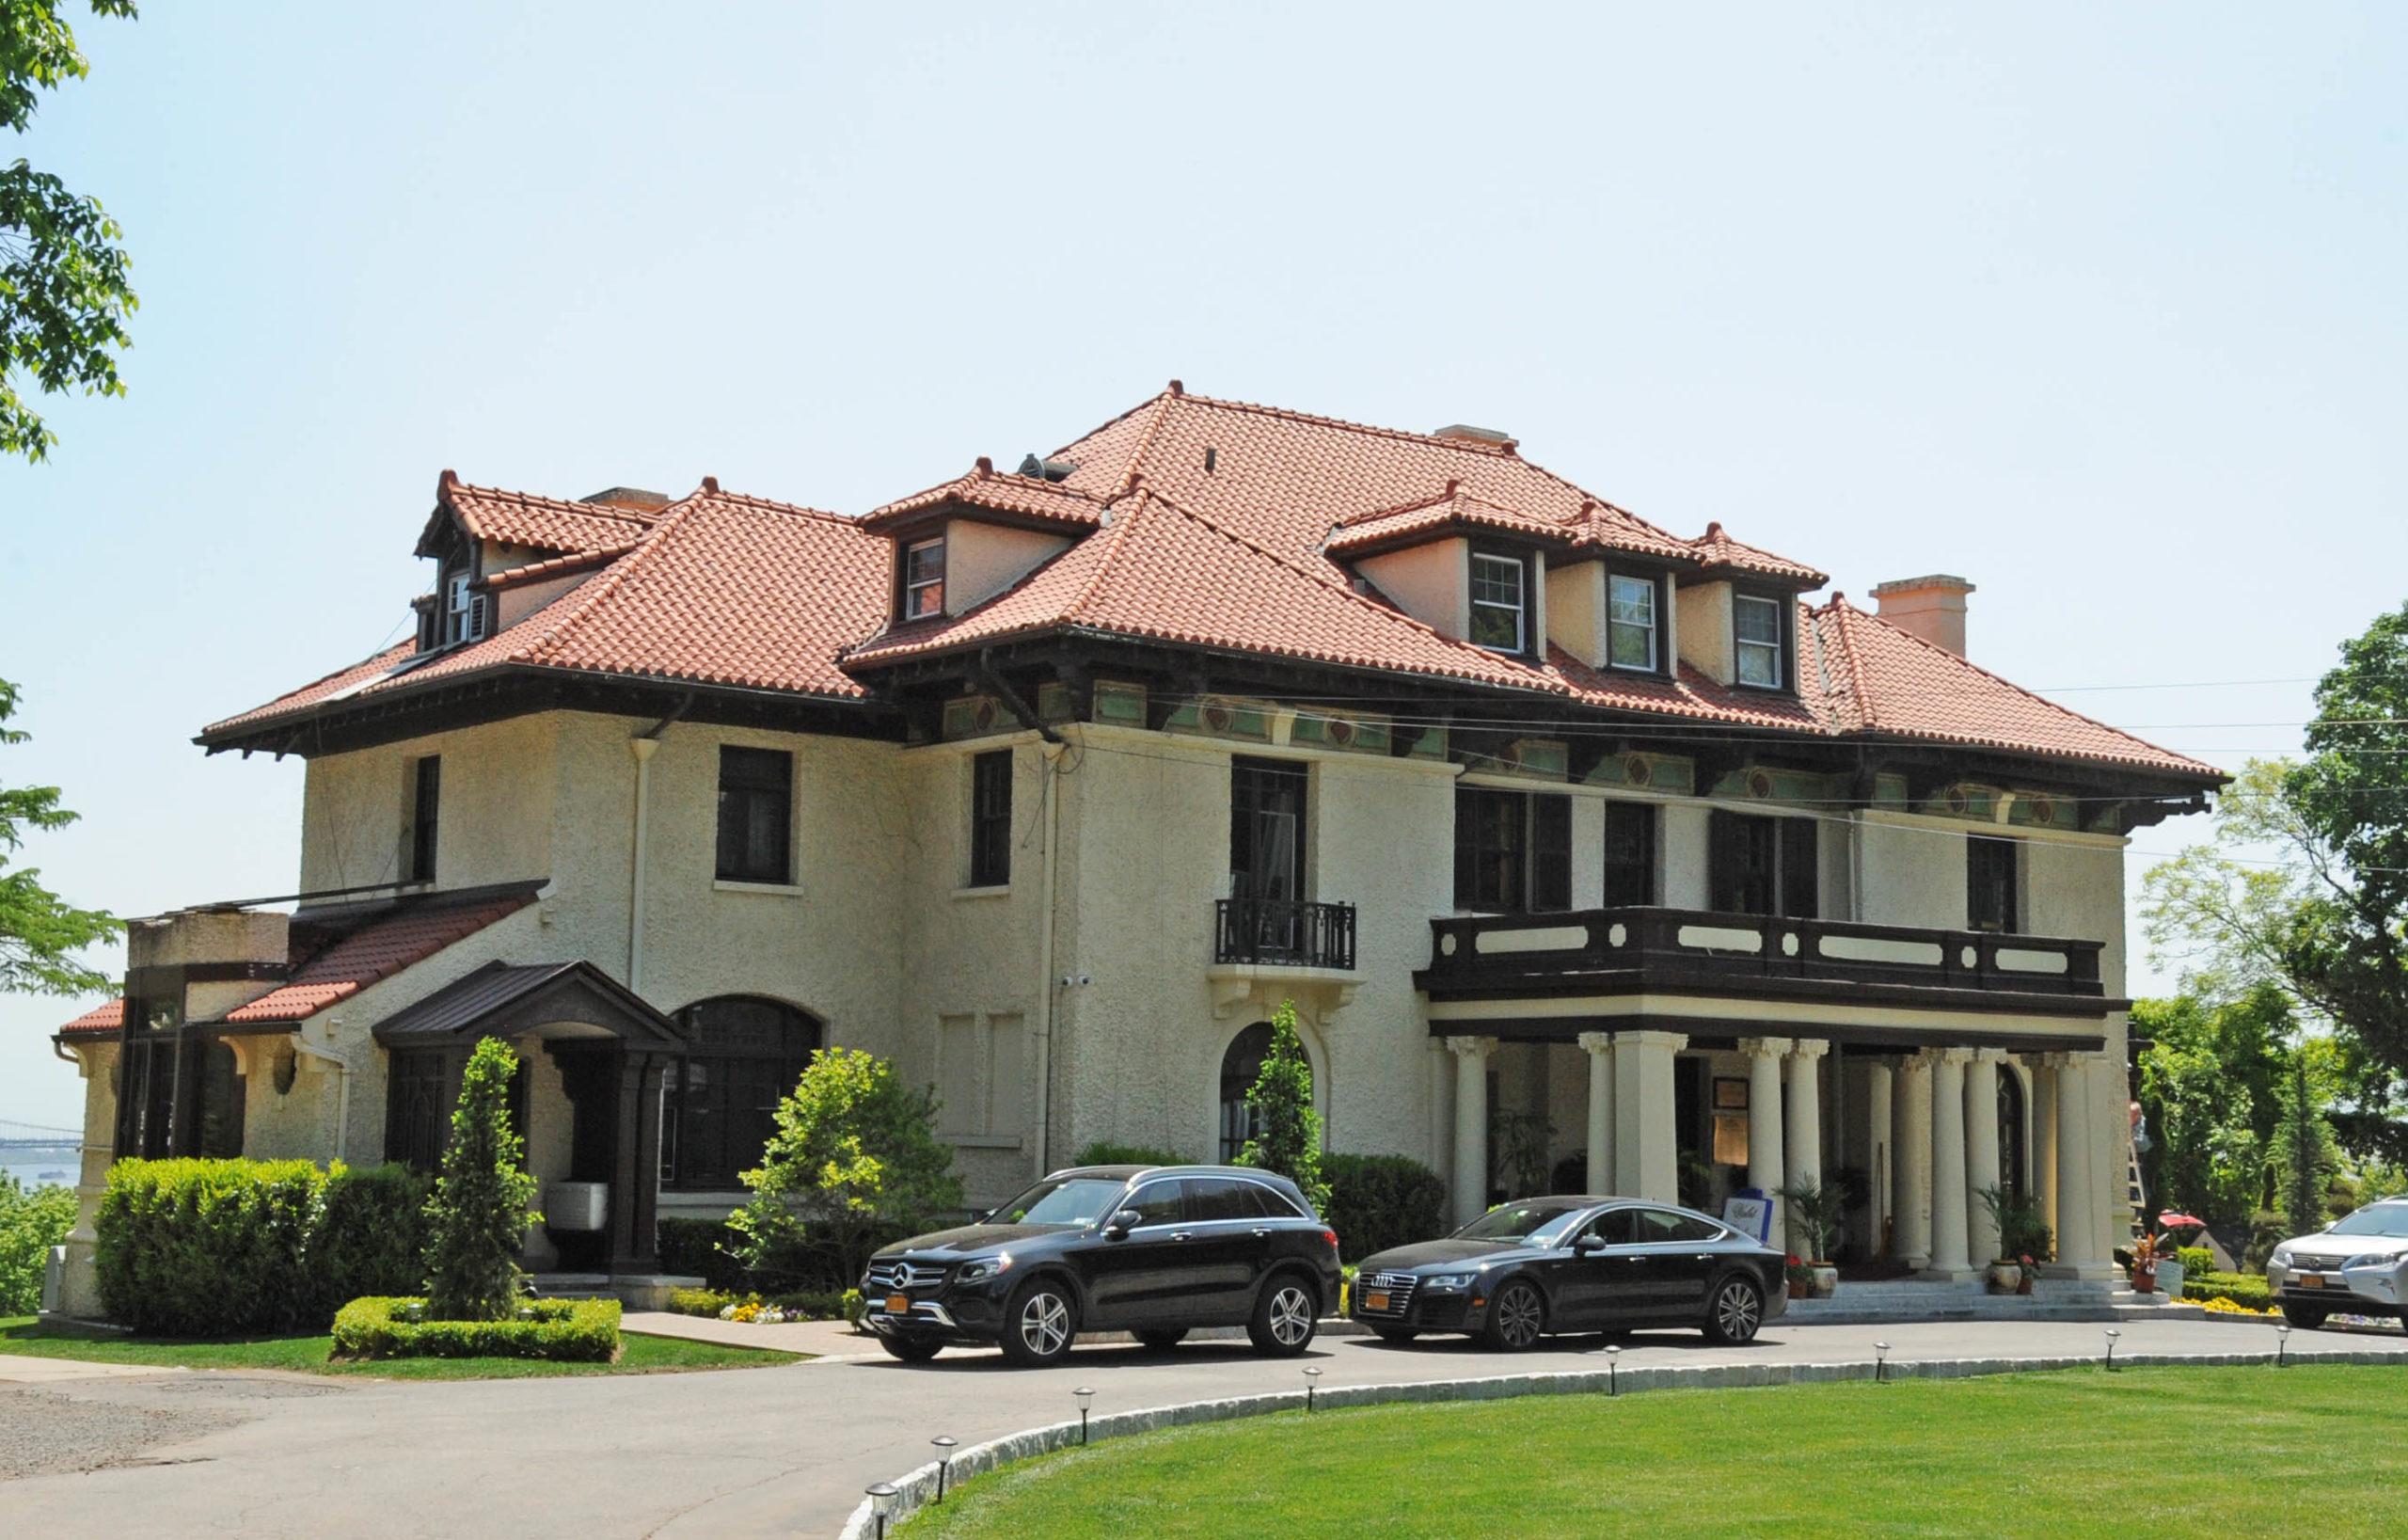 casa belvedere house